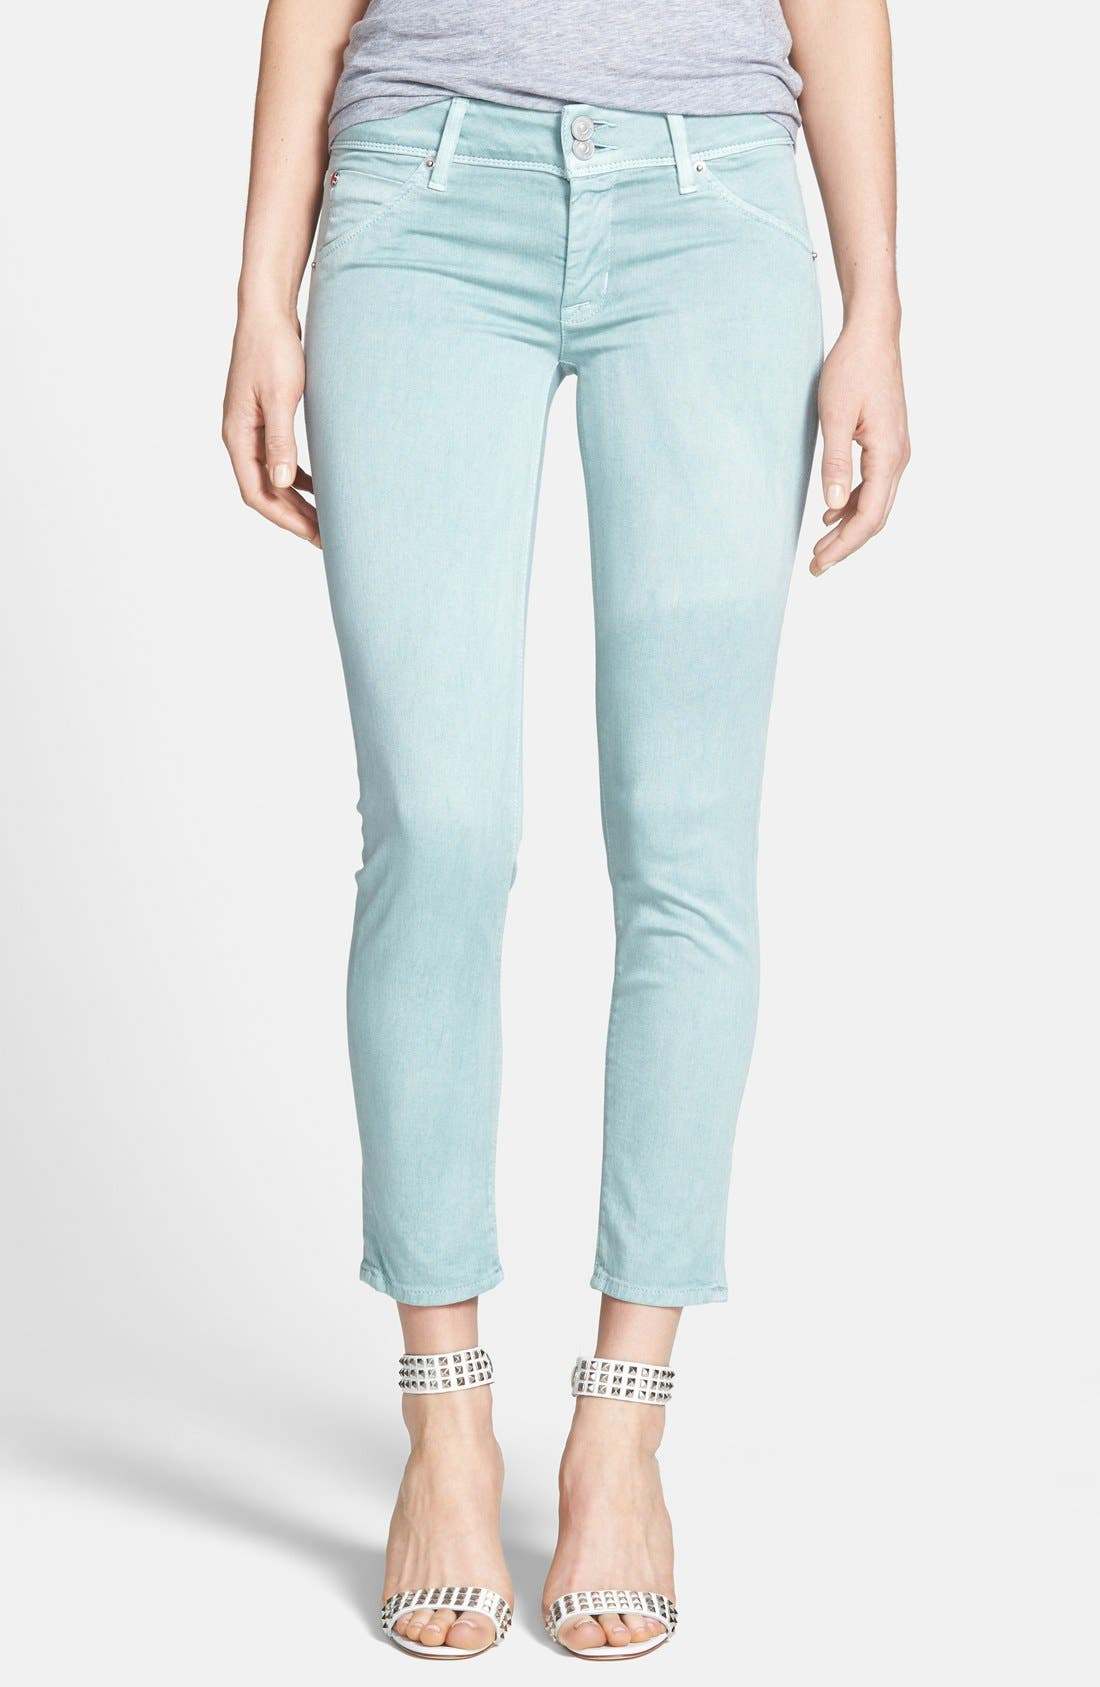 Main Image - Hudson Jeans 'Collin' Crop Skinny Jeans (Dusty Pistachio)